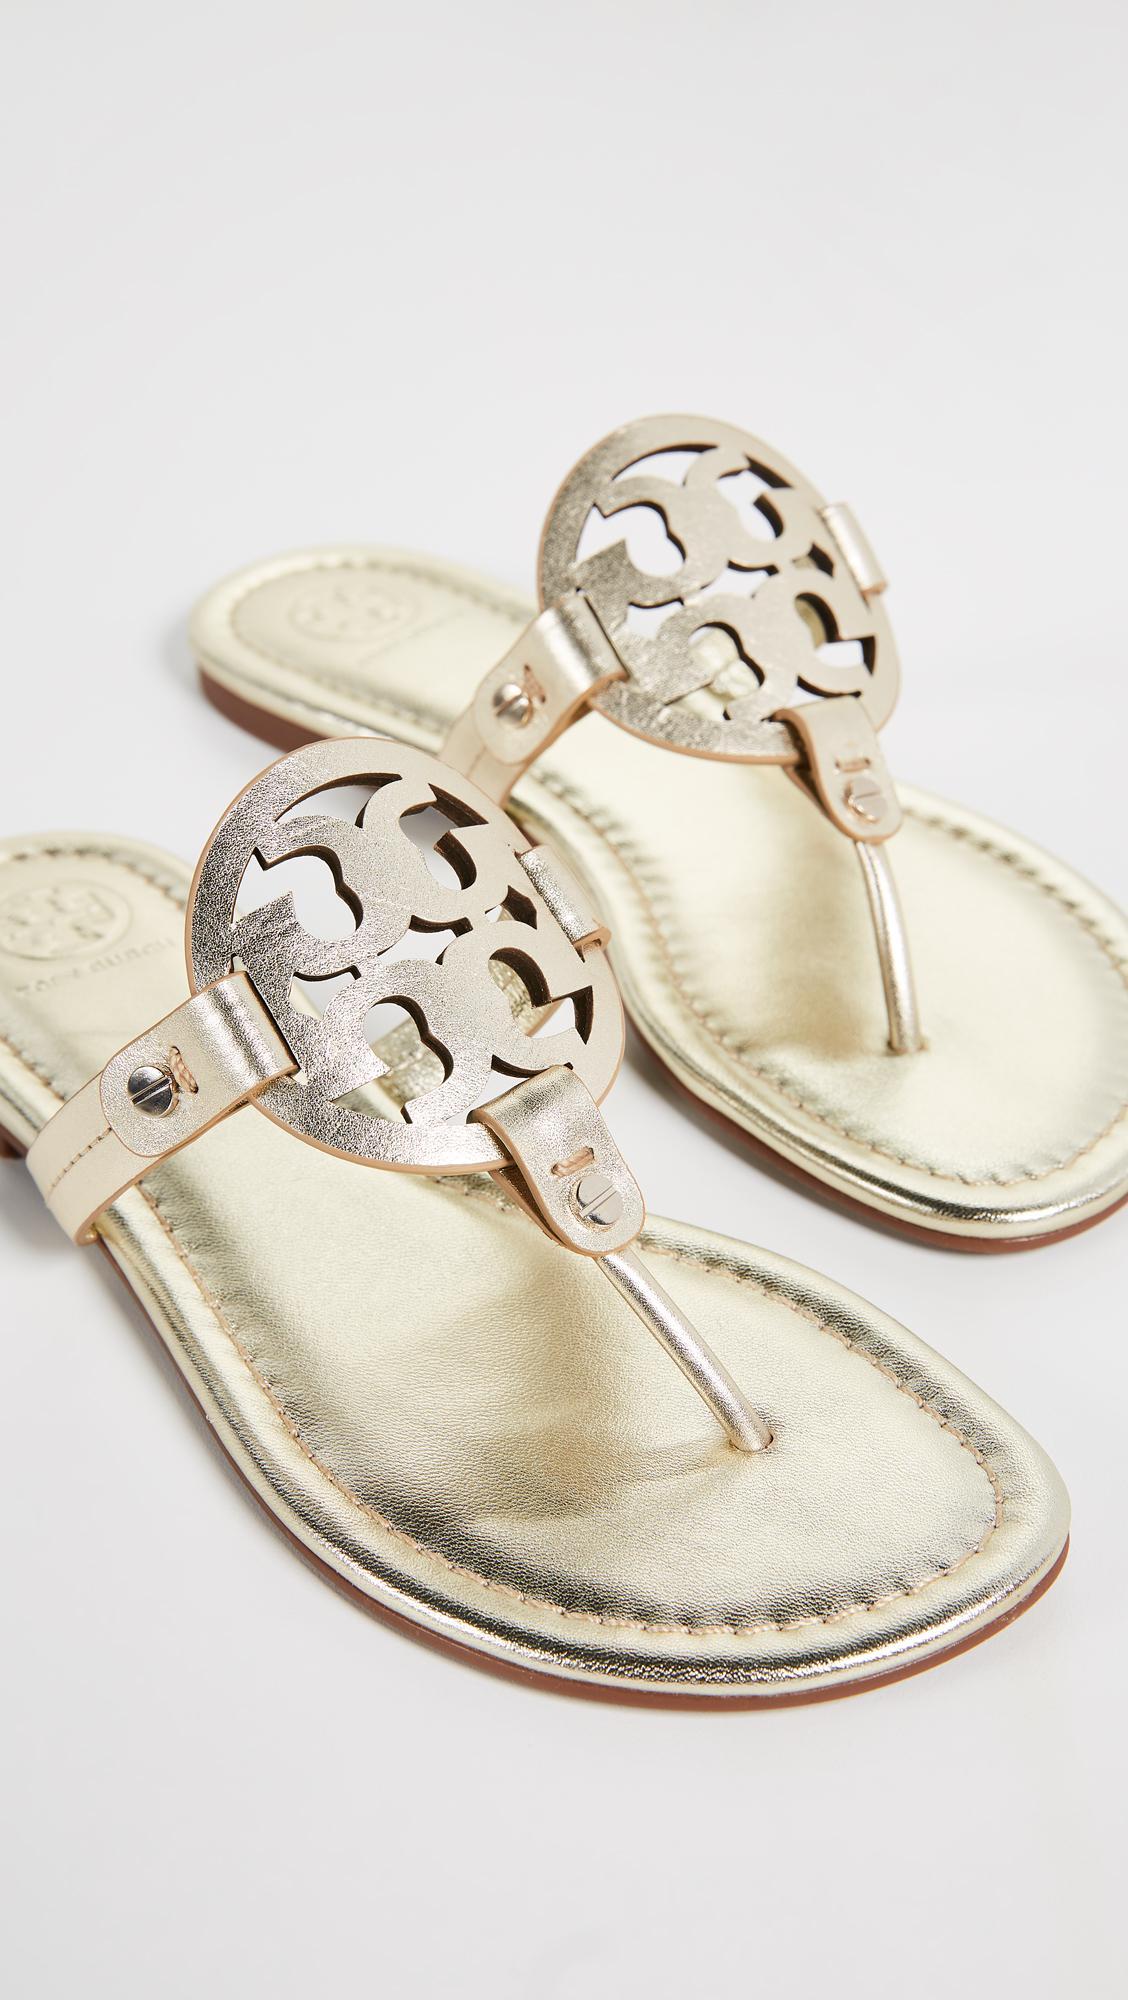 6bc99ee41d7e8d Lyst - Tory Burch Miller Thong Sandals - Save 15%